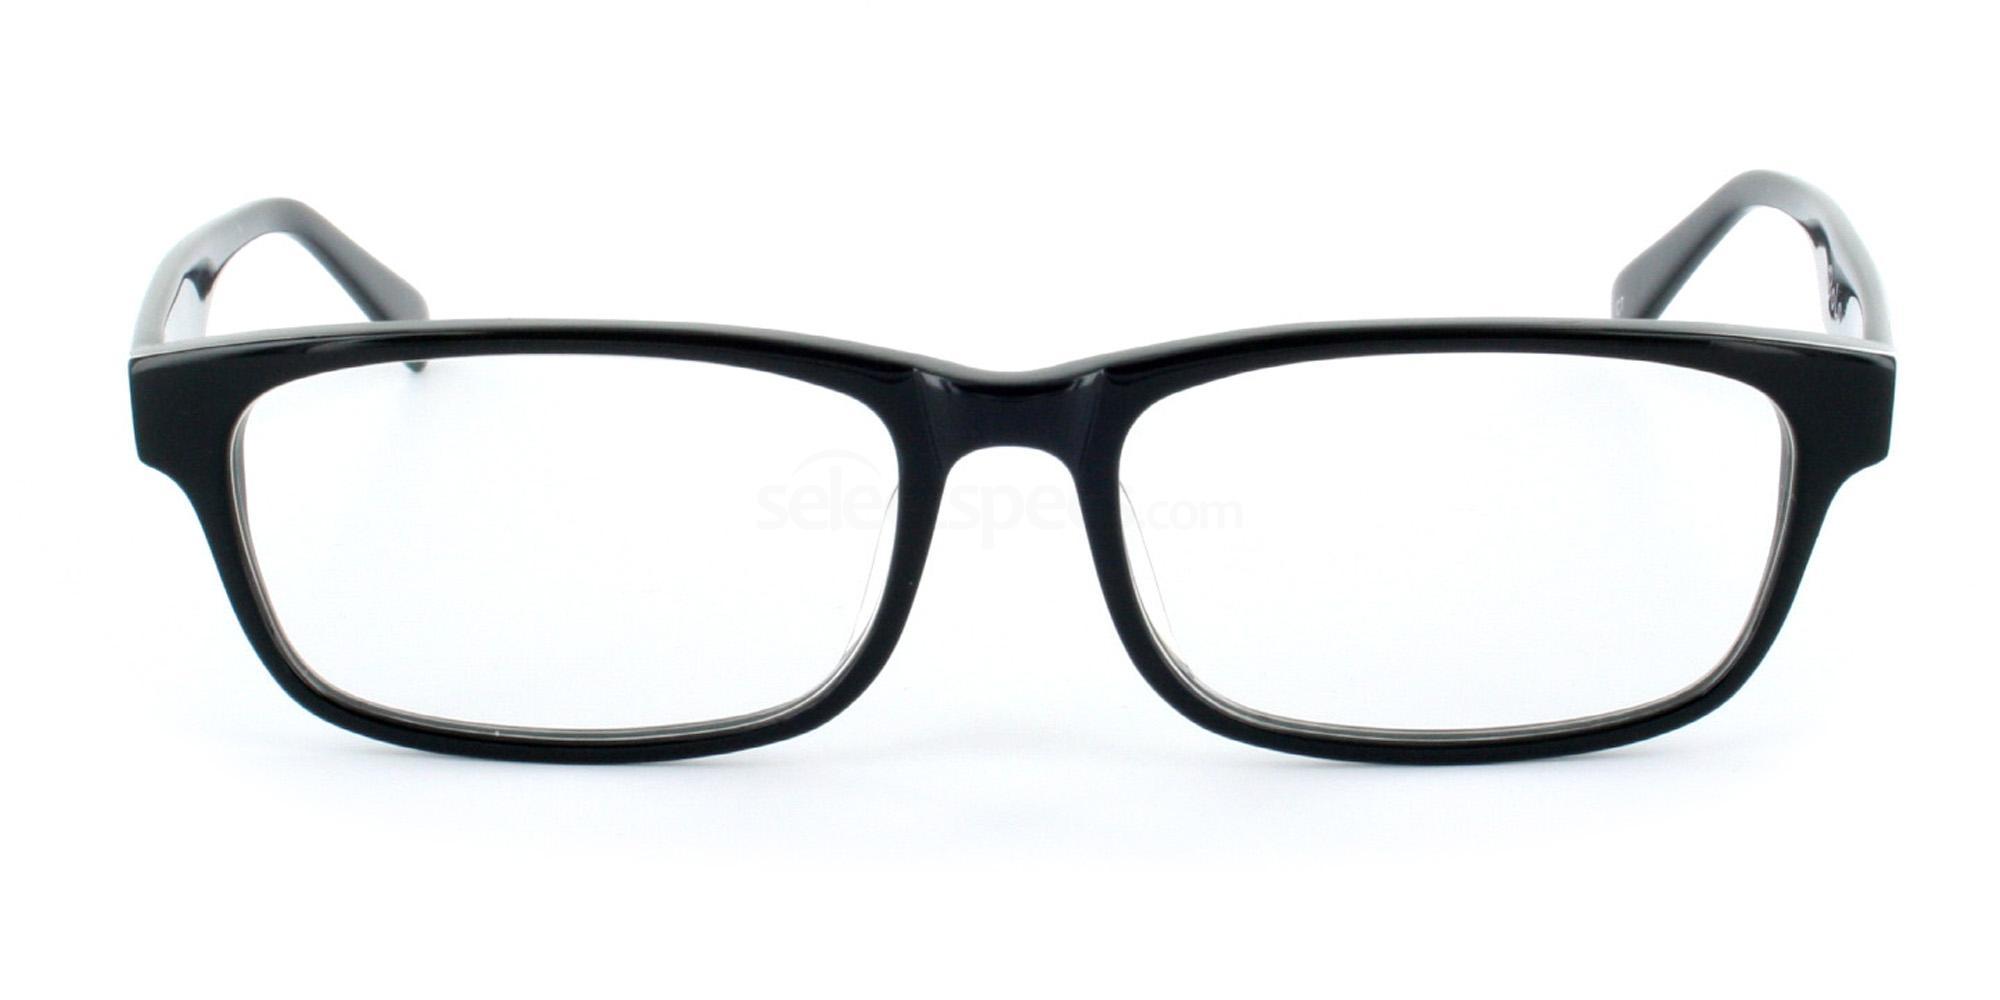 Hallmark HY81100 glasses